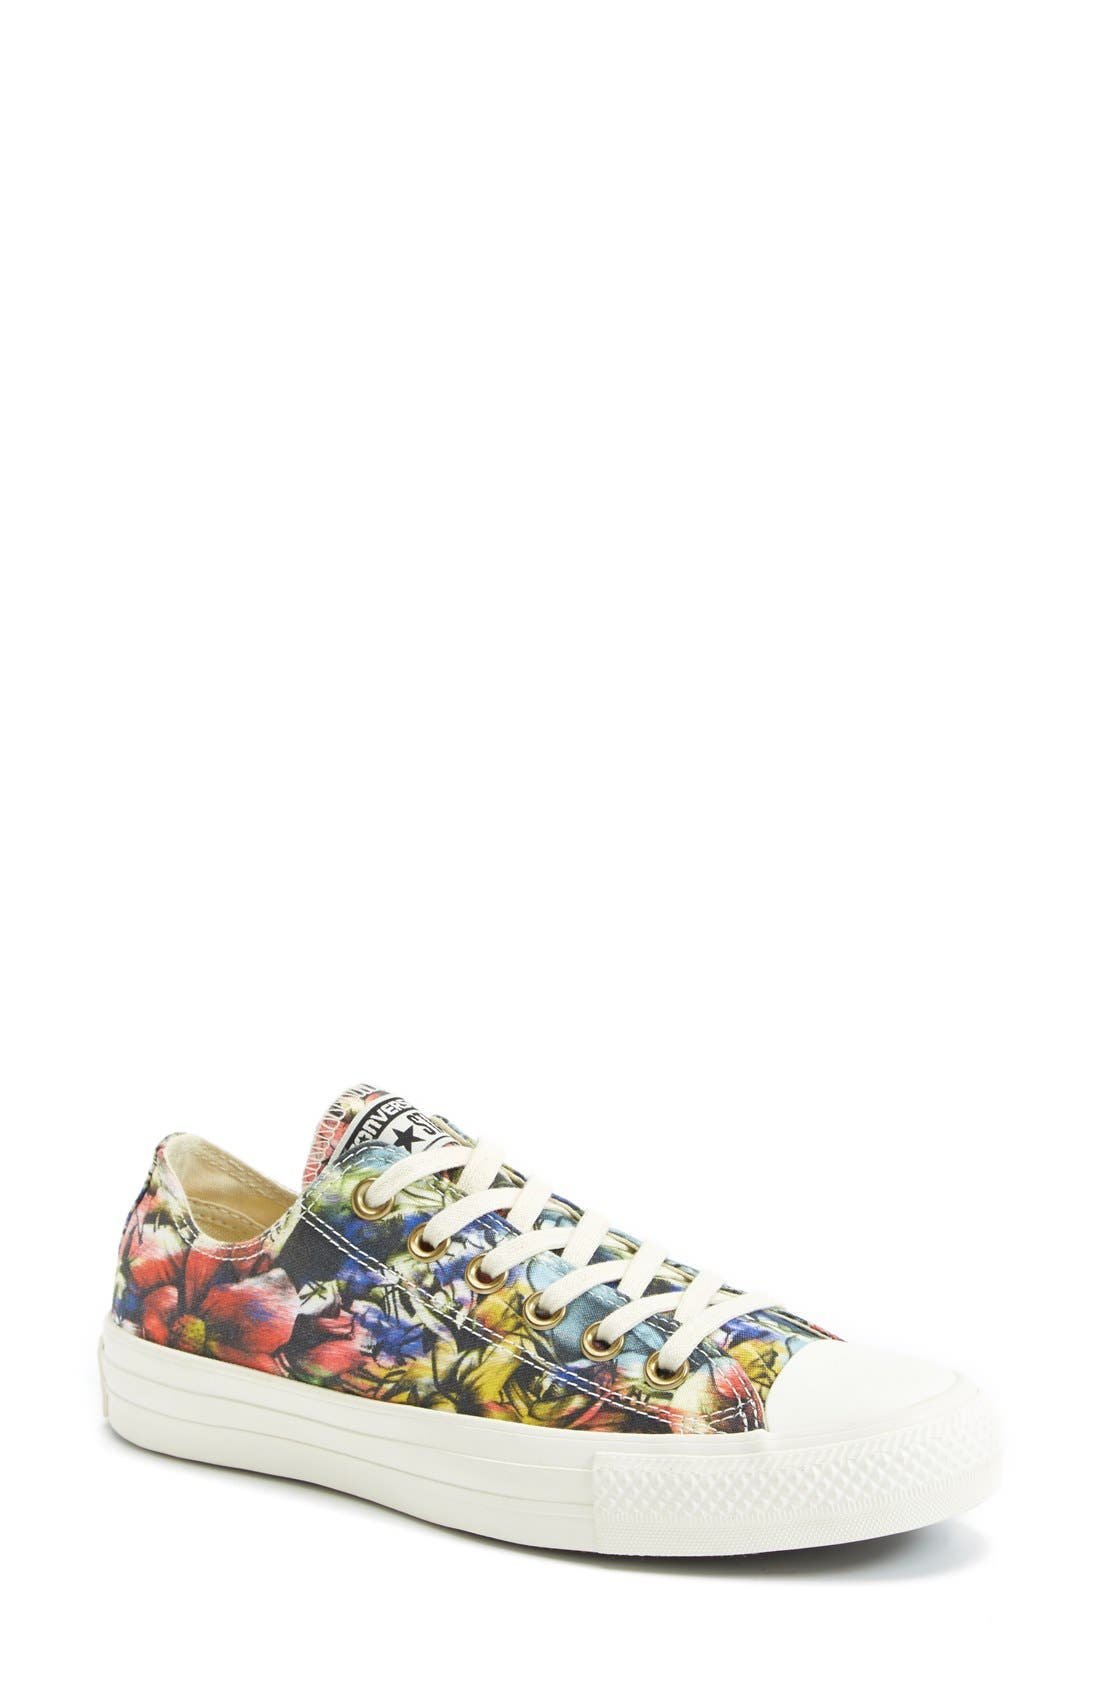 Main Image - Converse Chuck Taylor® Floral Print Sneaker (Women)